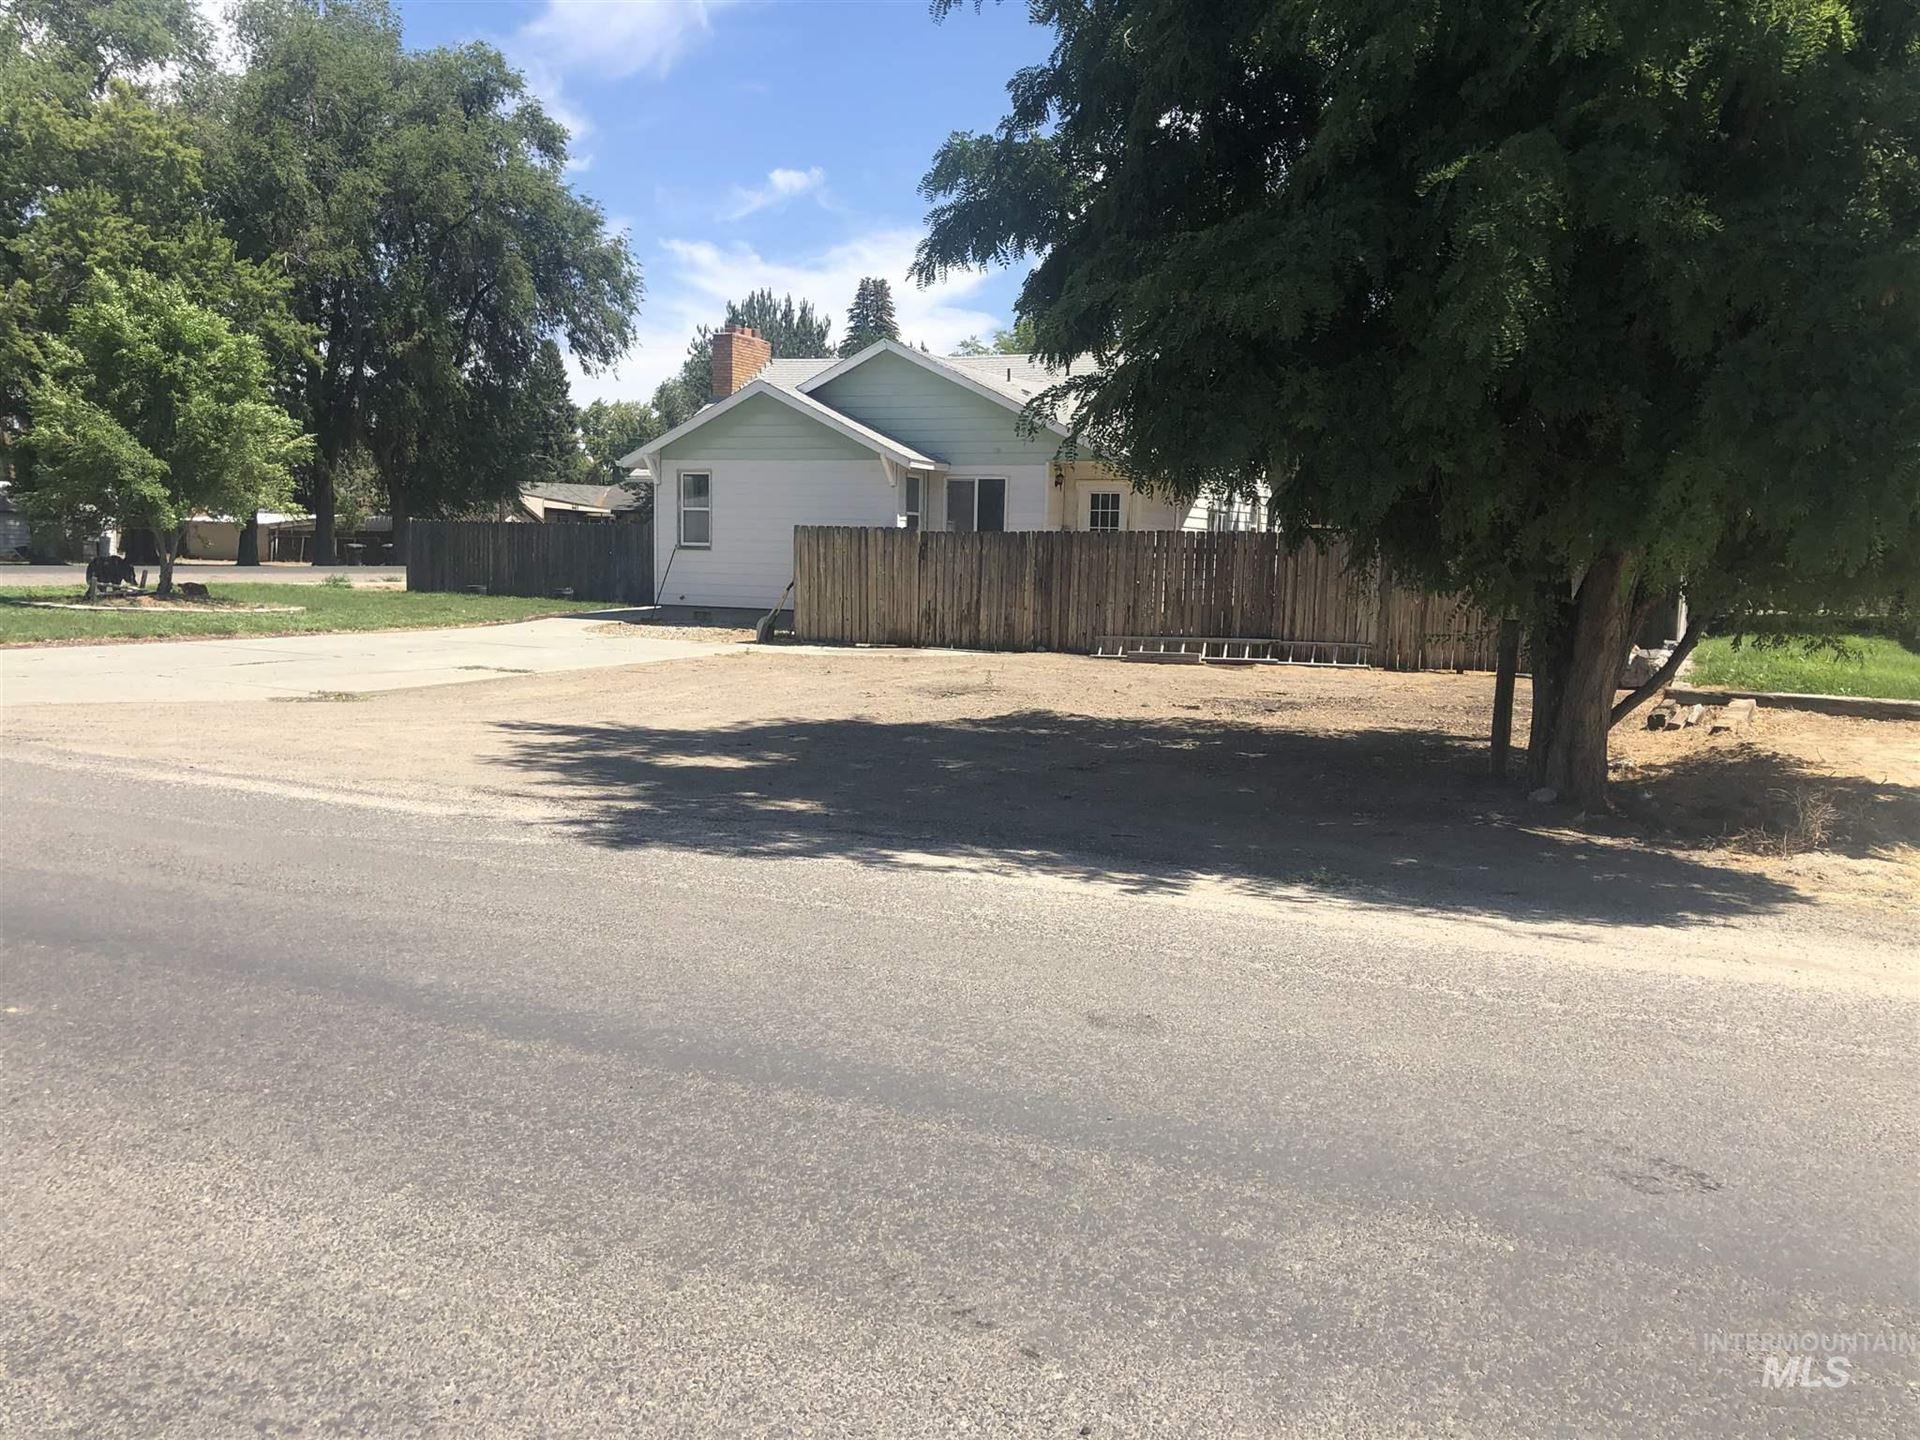 Photo of 706 Utah St, Gooding, ID 83330 (MLS # 98776654)